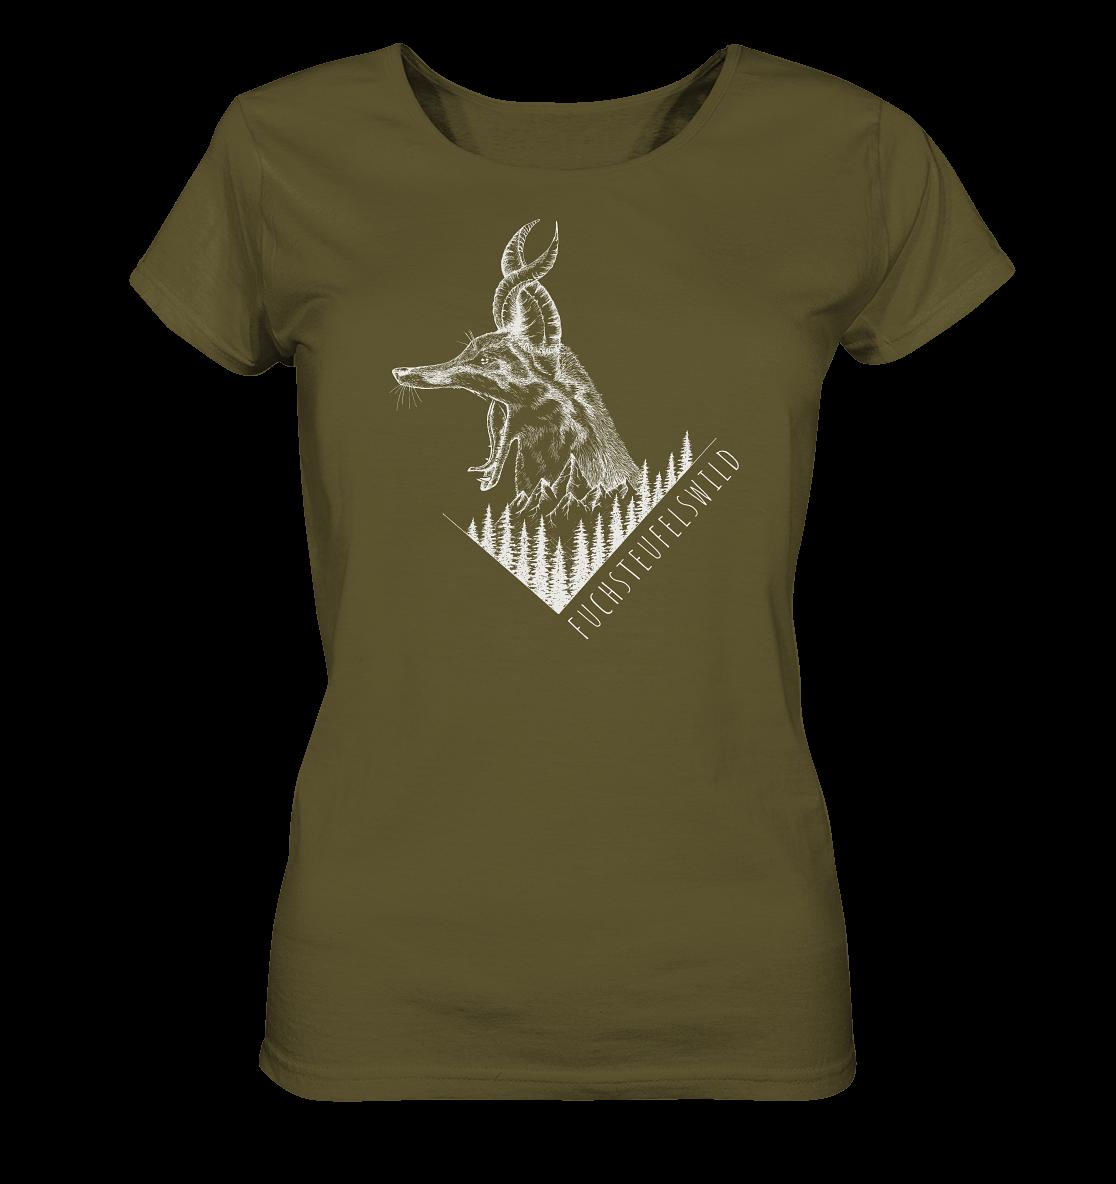 front-ladies-organic-shirt-5e5530-1116x-3.png